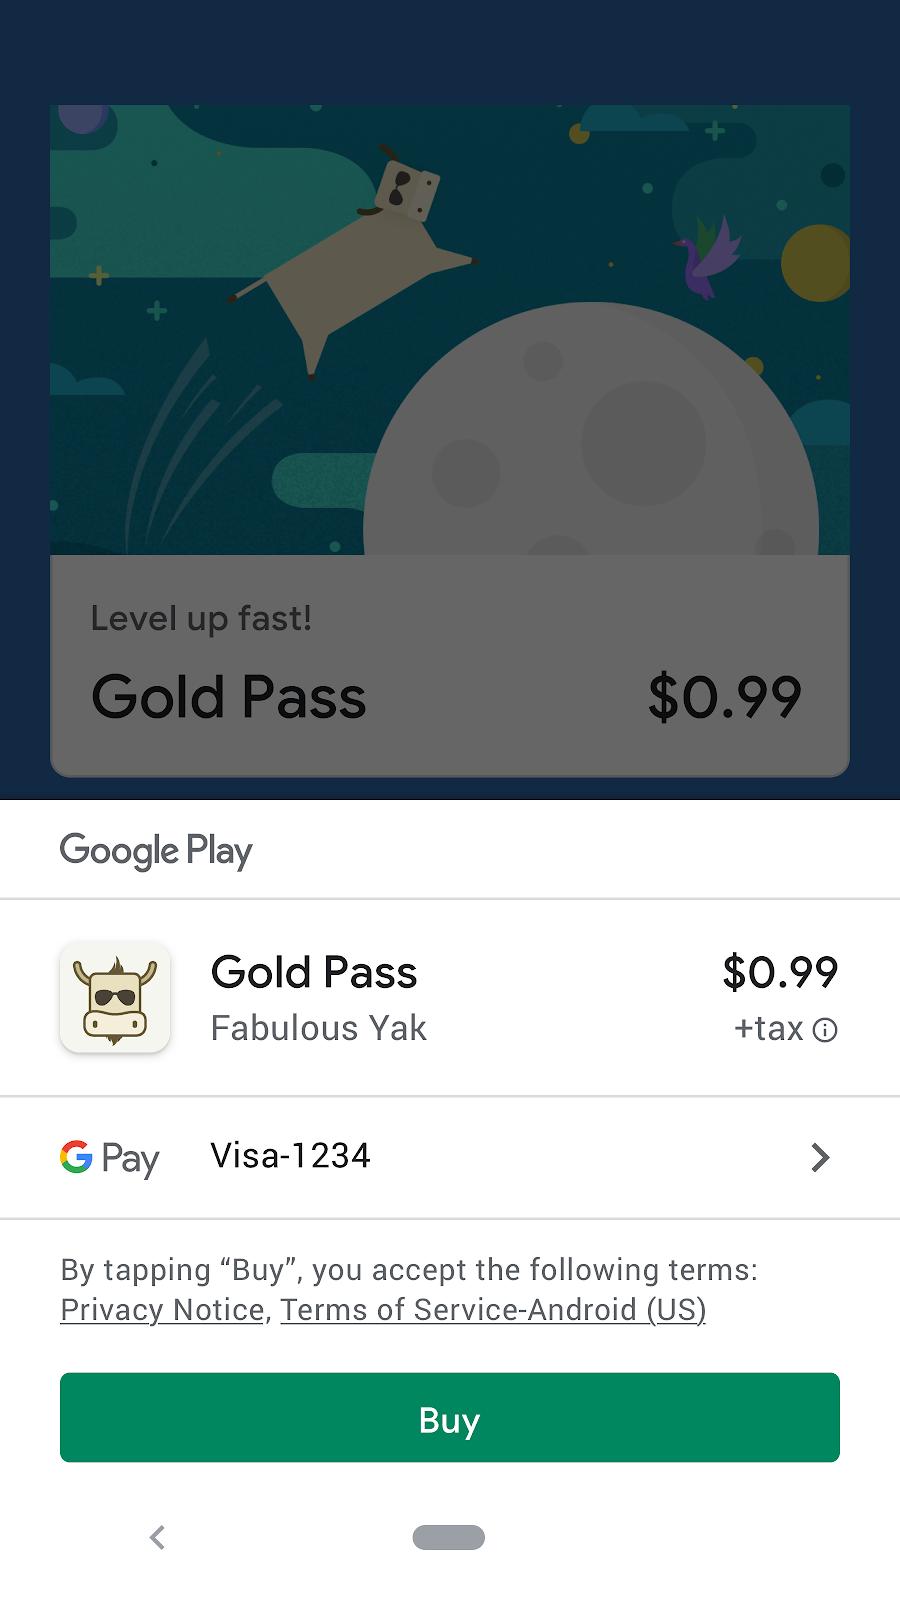 Google Play 결제 시스템을 사용하여 디지털 상품 또는 서비스 판매